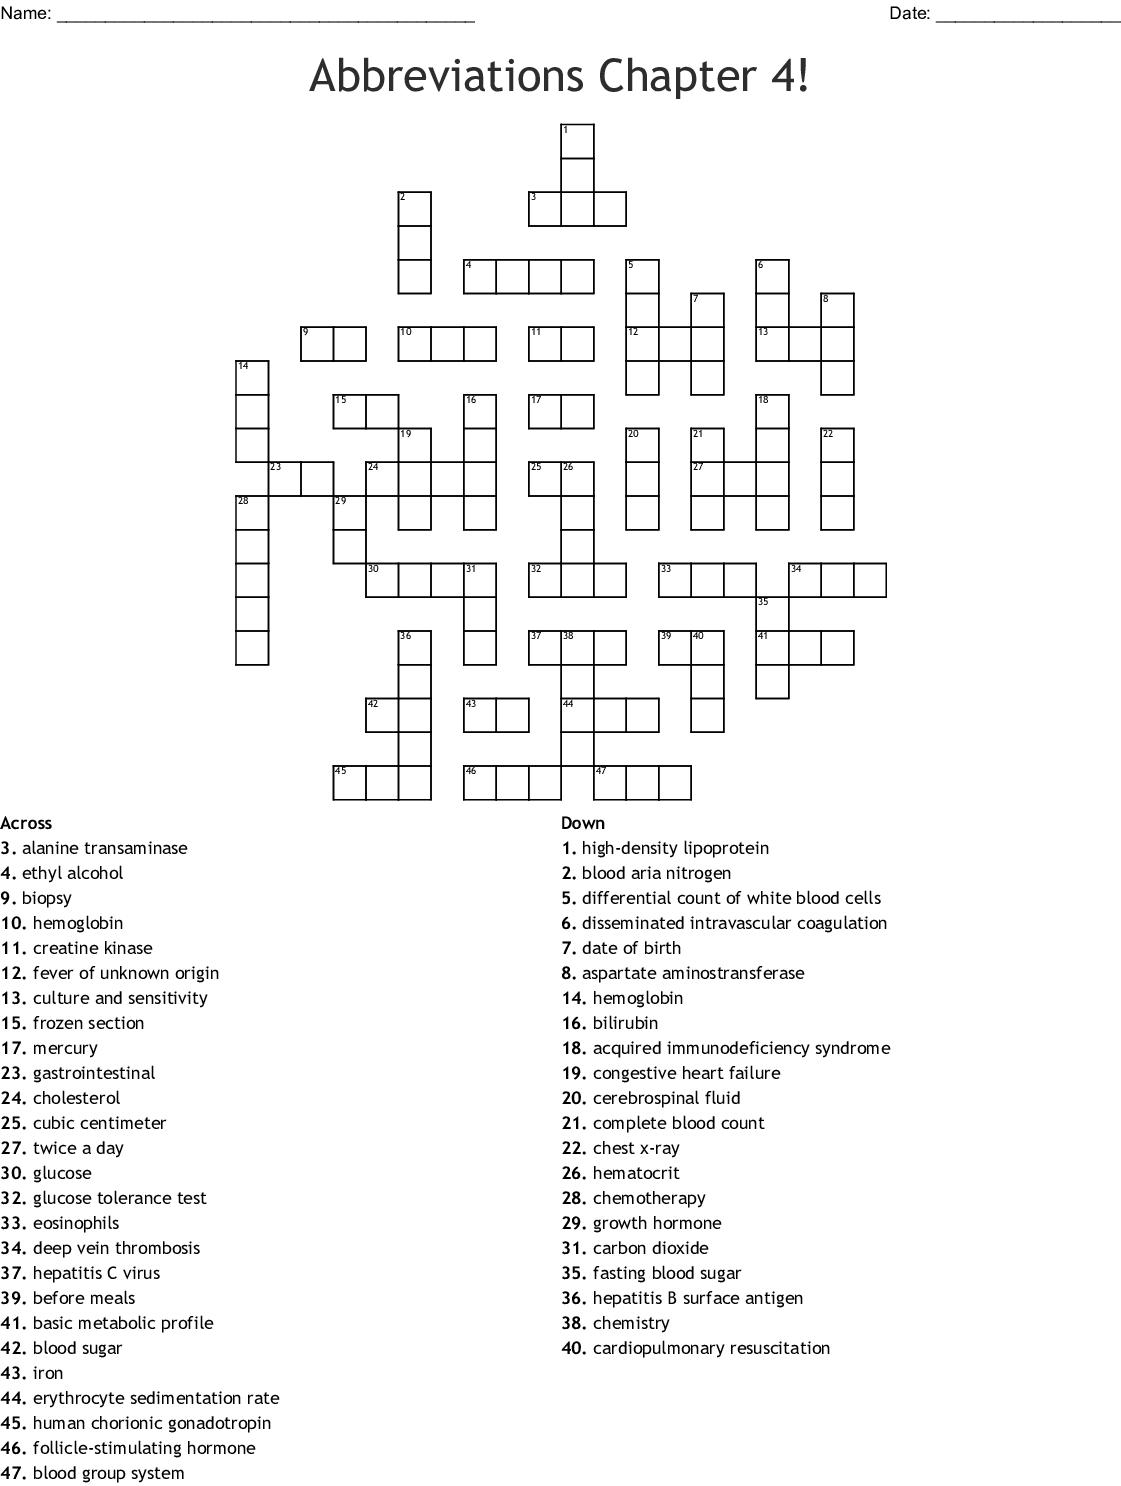 Common Medical Abbreviations Worksheet